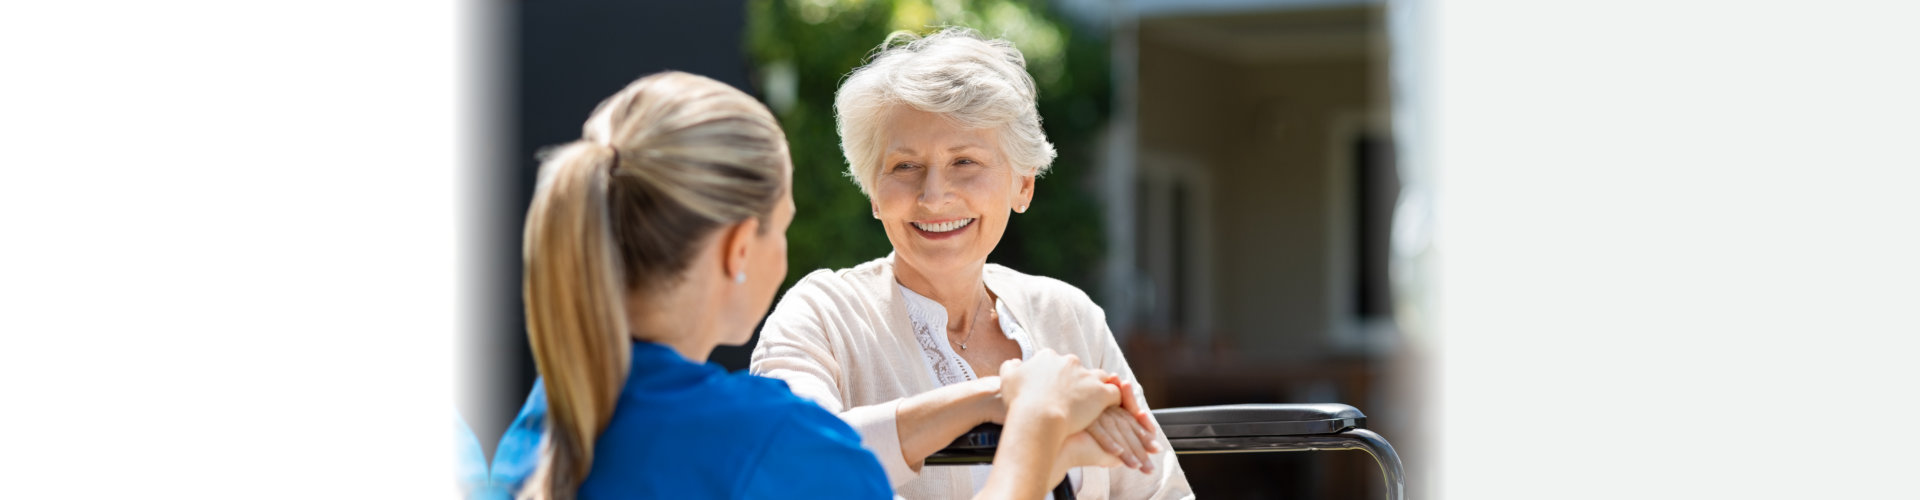 woman talking to senior woman